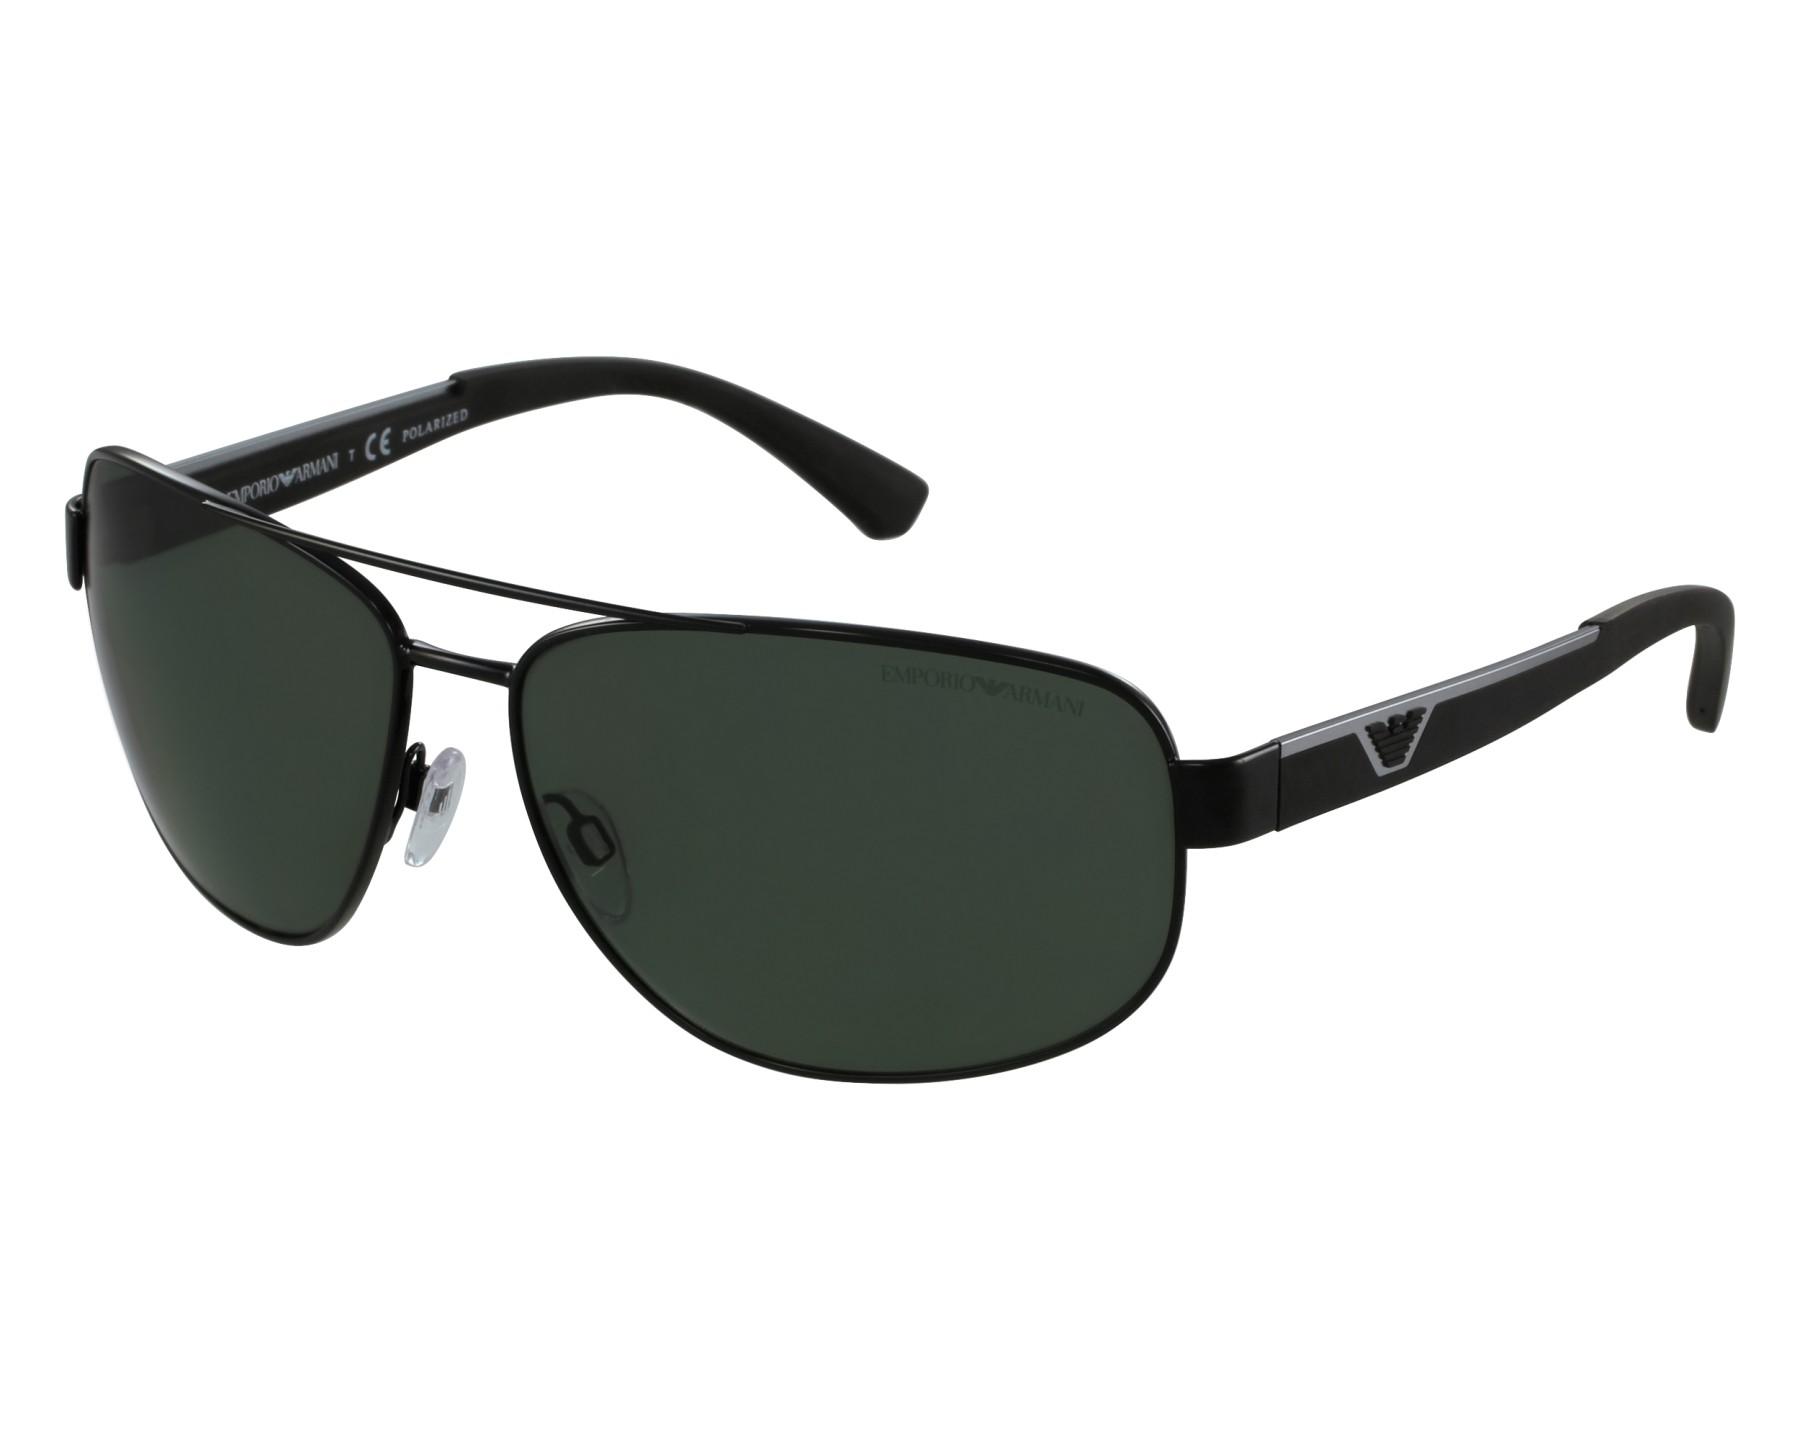 d21c67a1a787 Sunglasses Emporio Armani EA-2036 3014 9A 64-14 Black front view